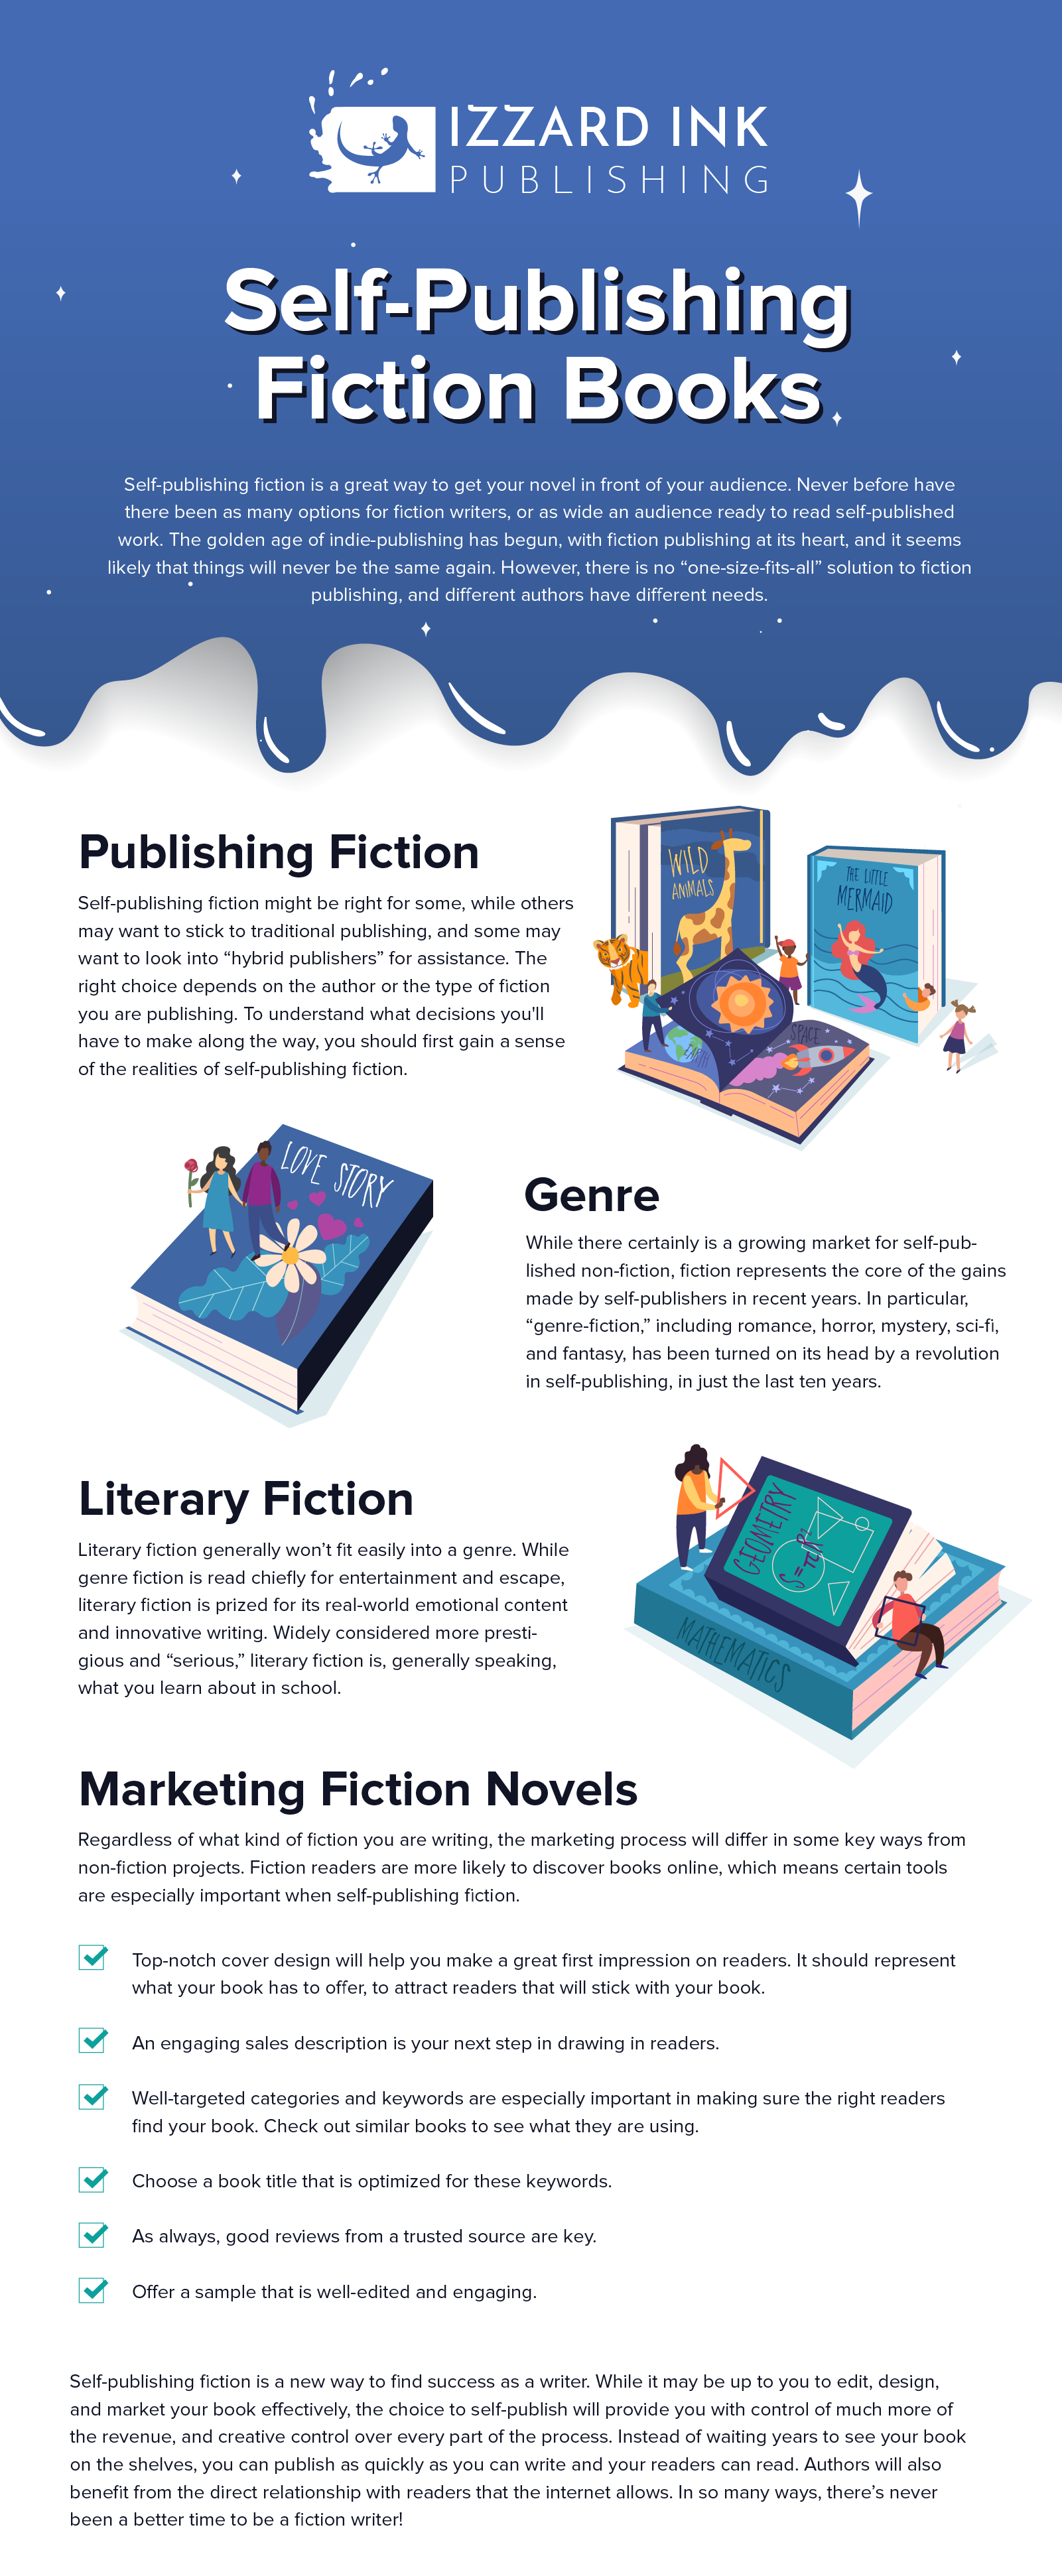 Self-Publishing Fiction Books Infographic